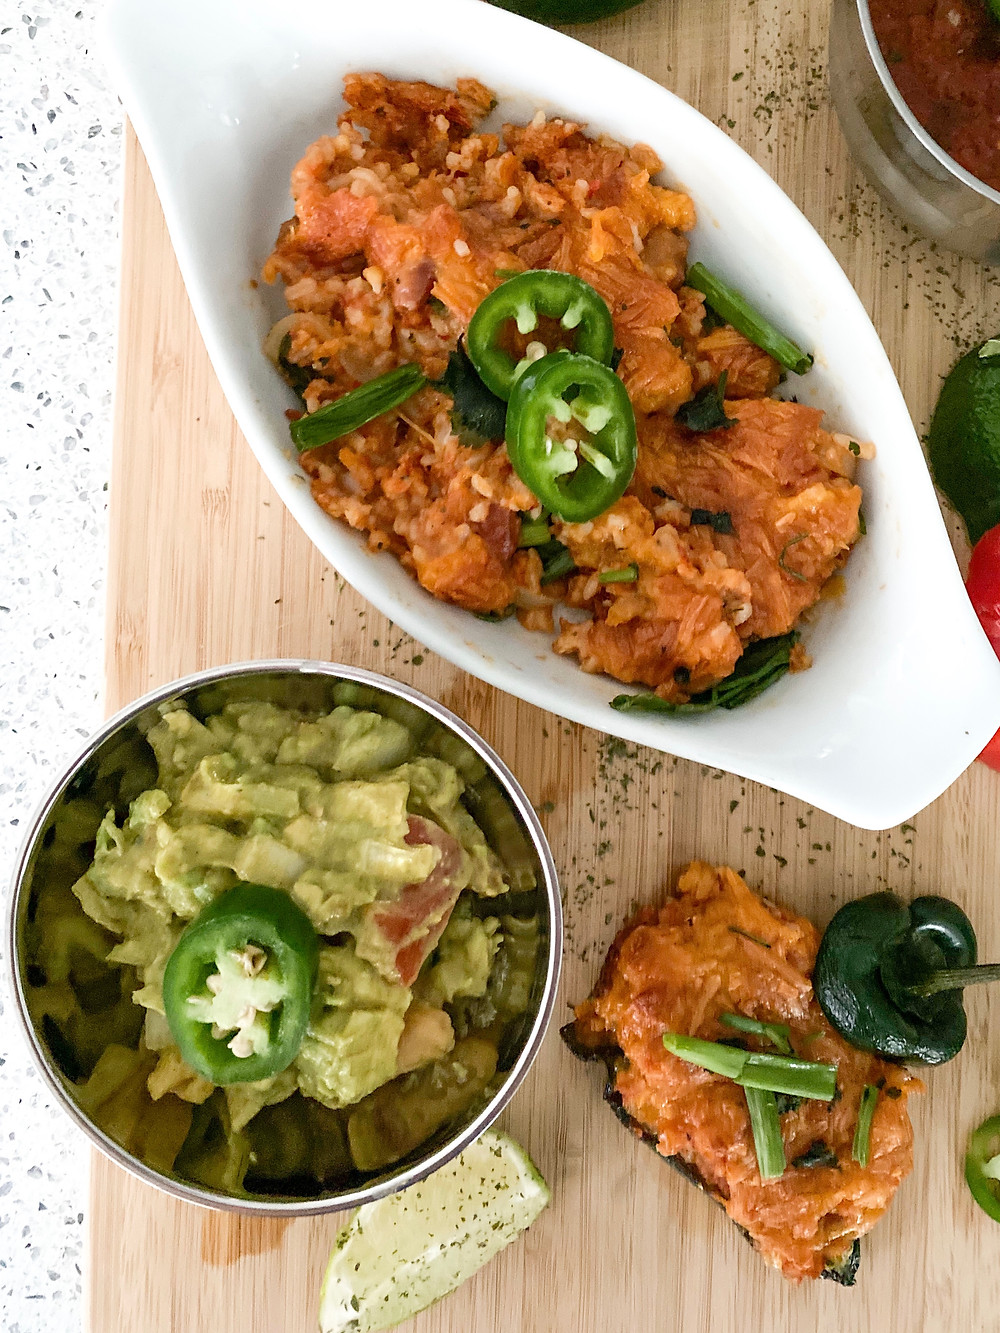 Holy Guacamole! Cinco De Mayo Celebration Recipes! #cincodemayo #mexicanfood